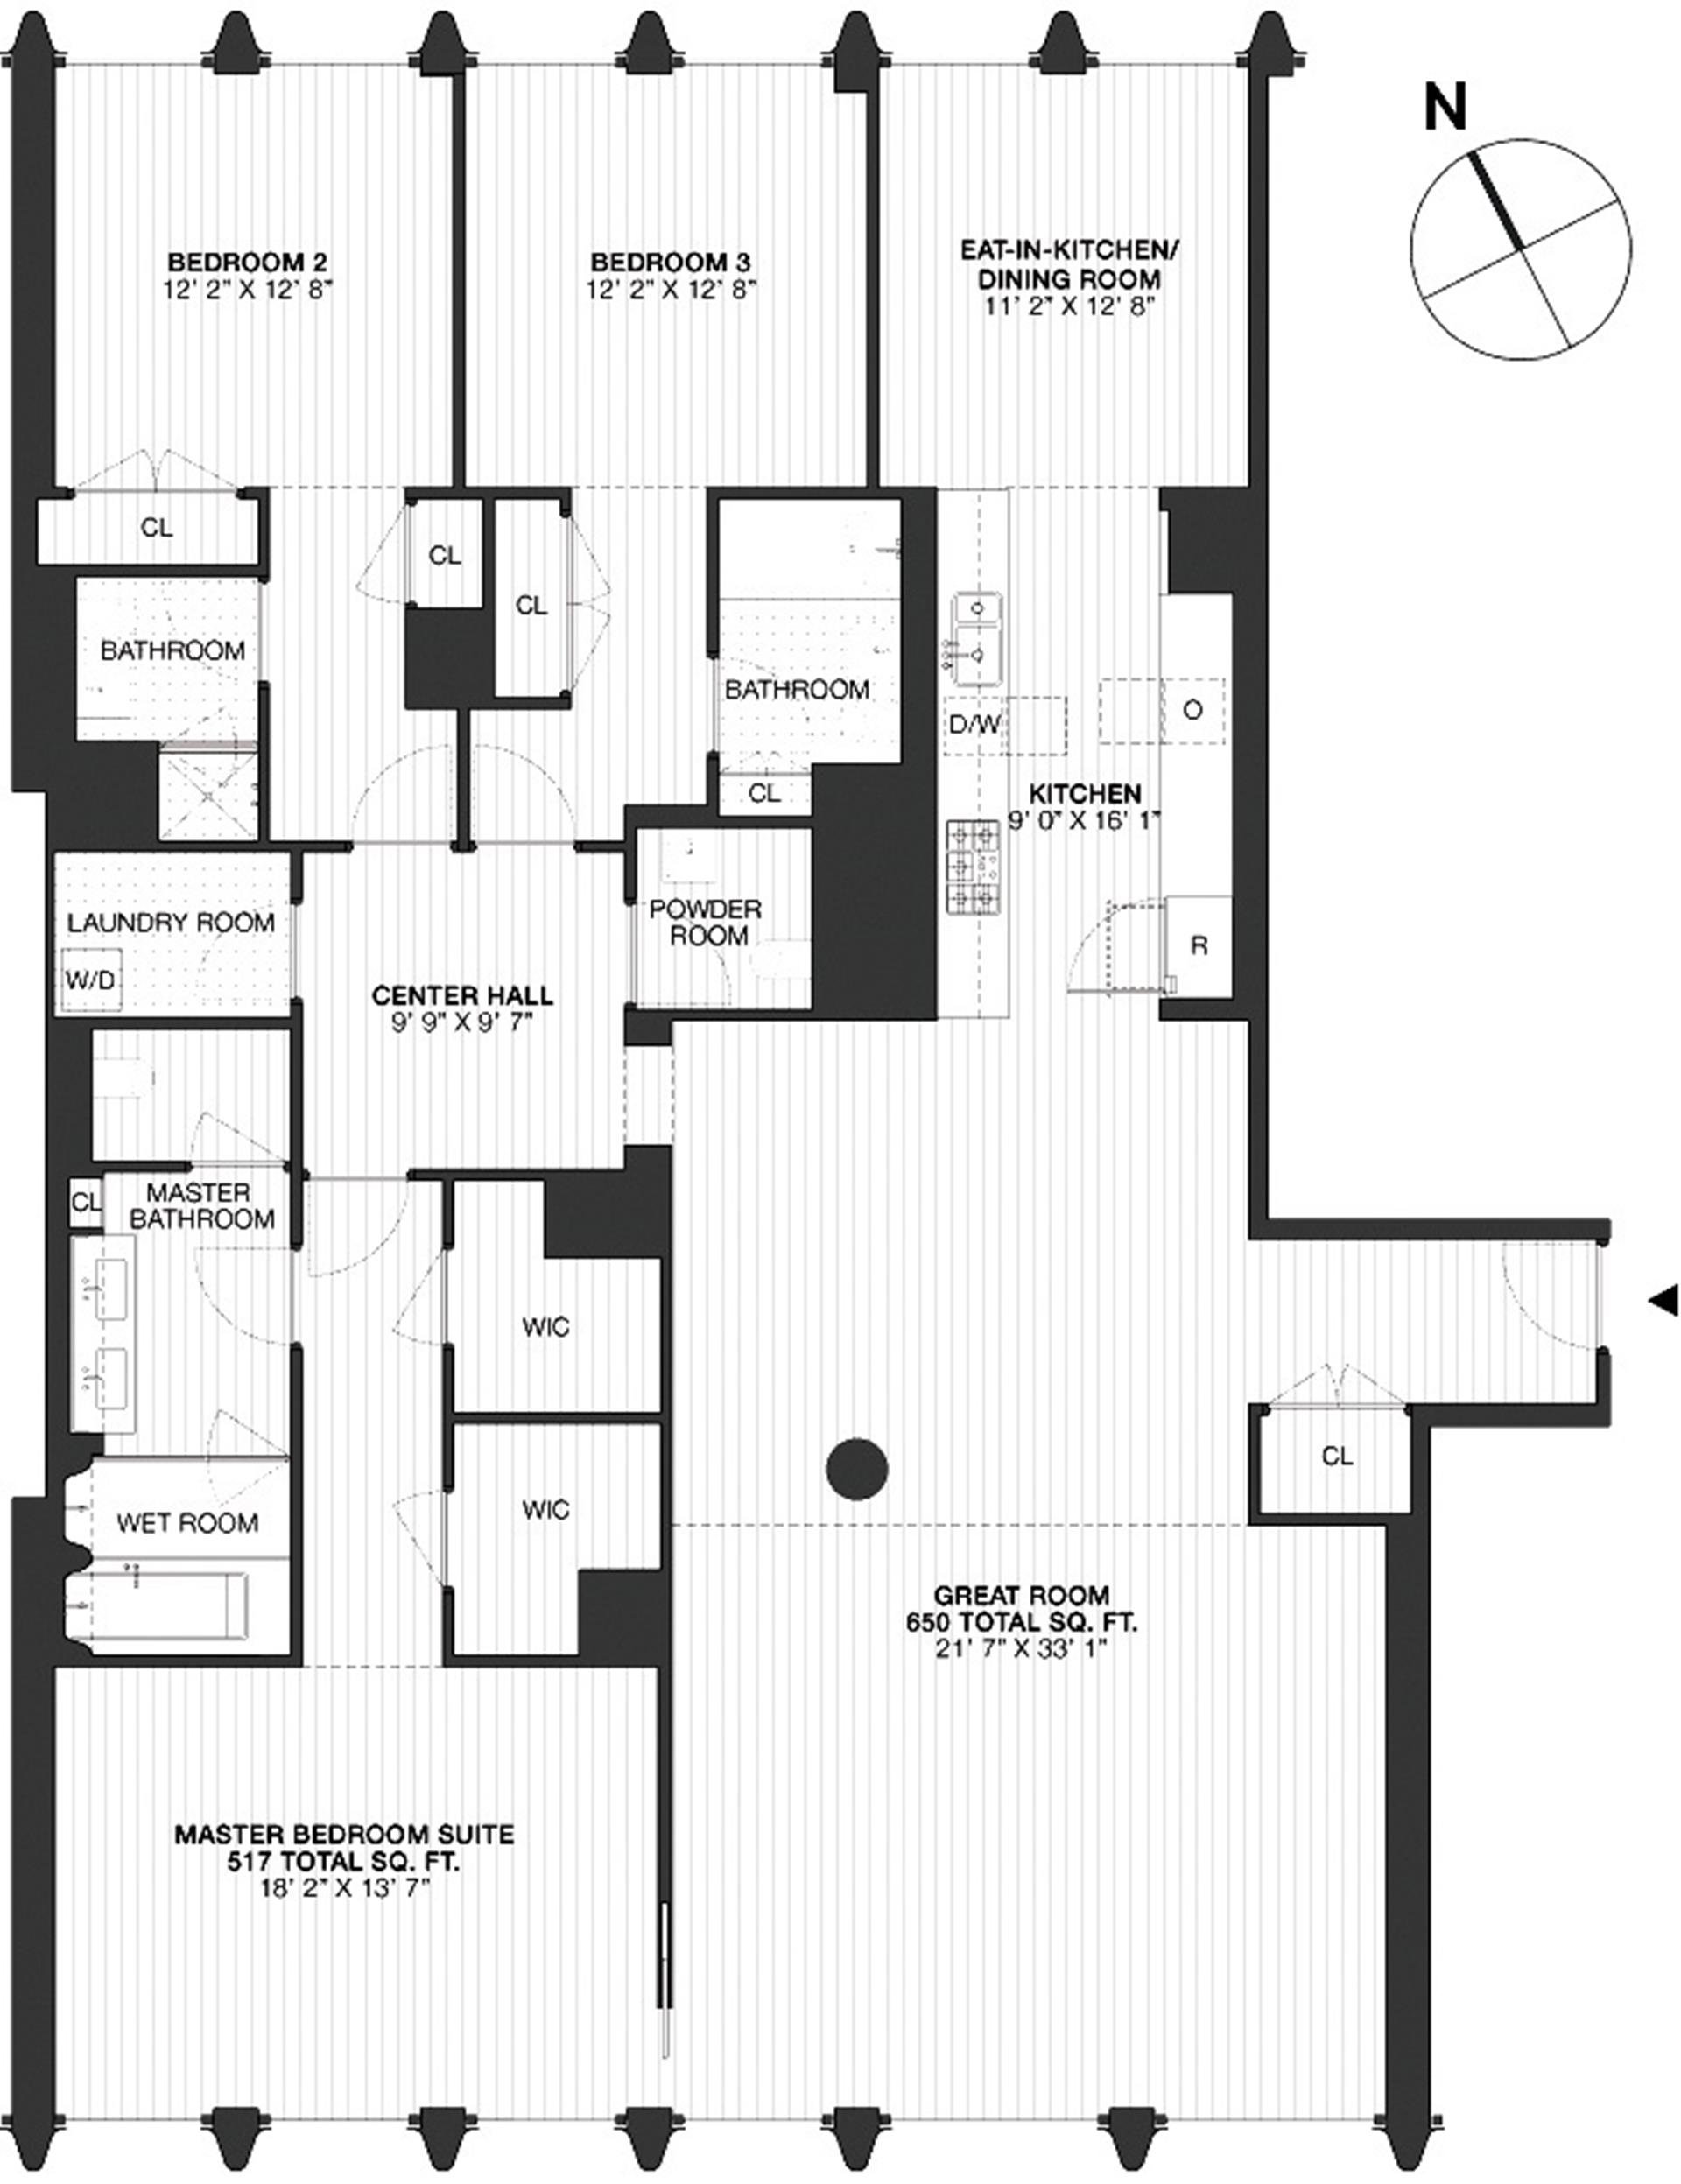 Floor plan of 40 Bond St, 5A - NoHo, New York